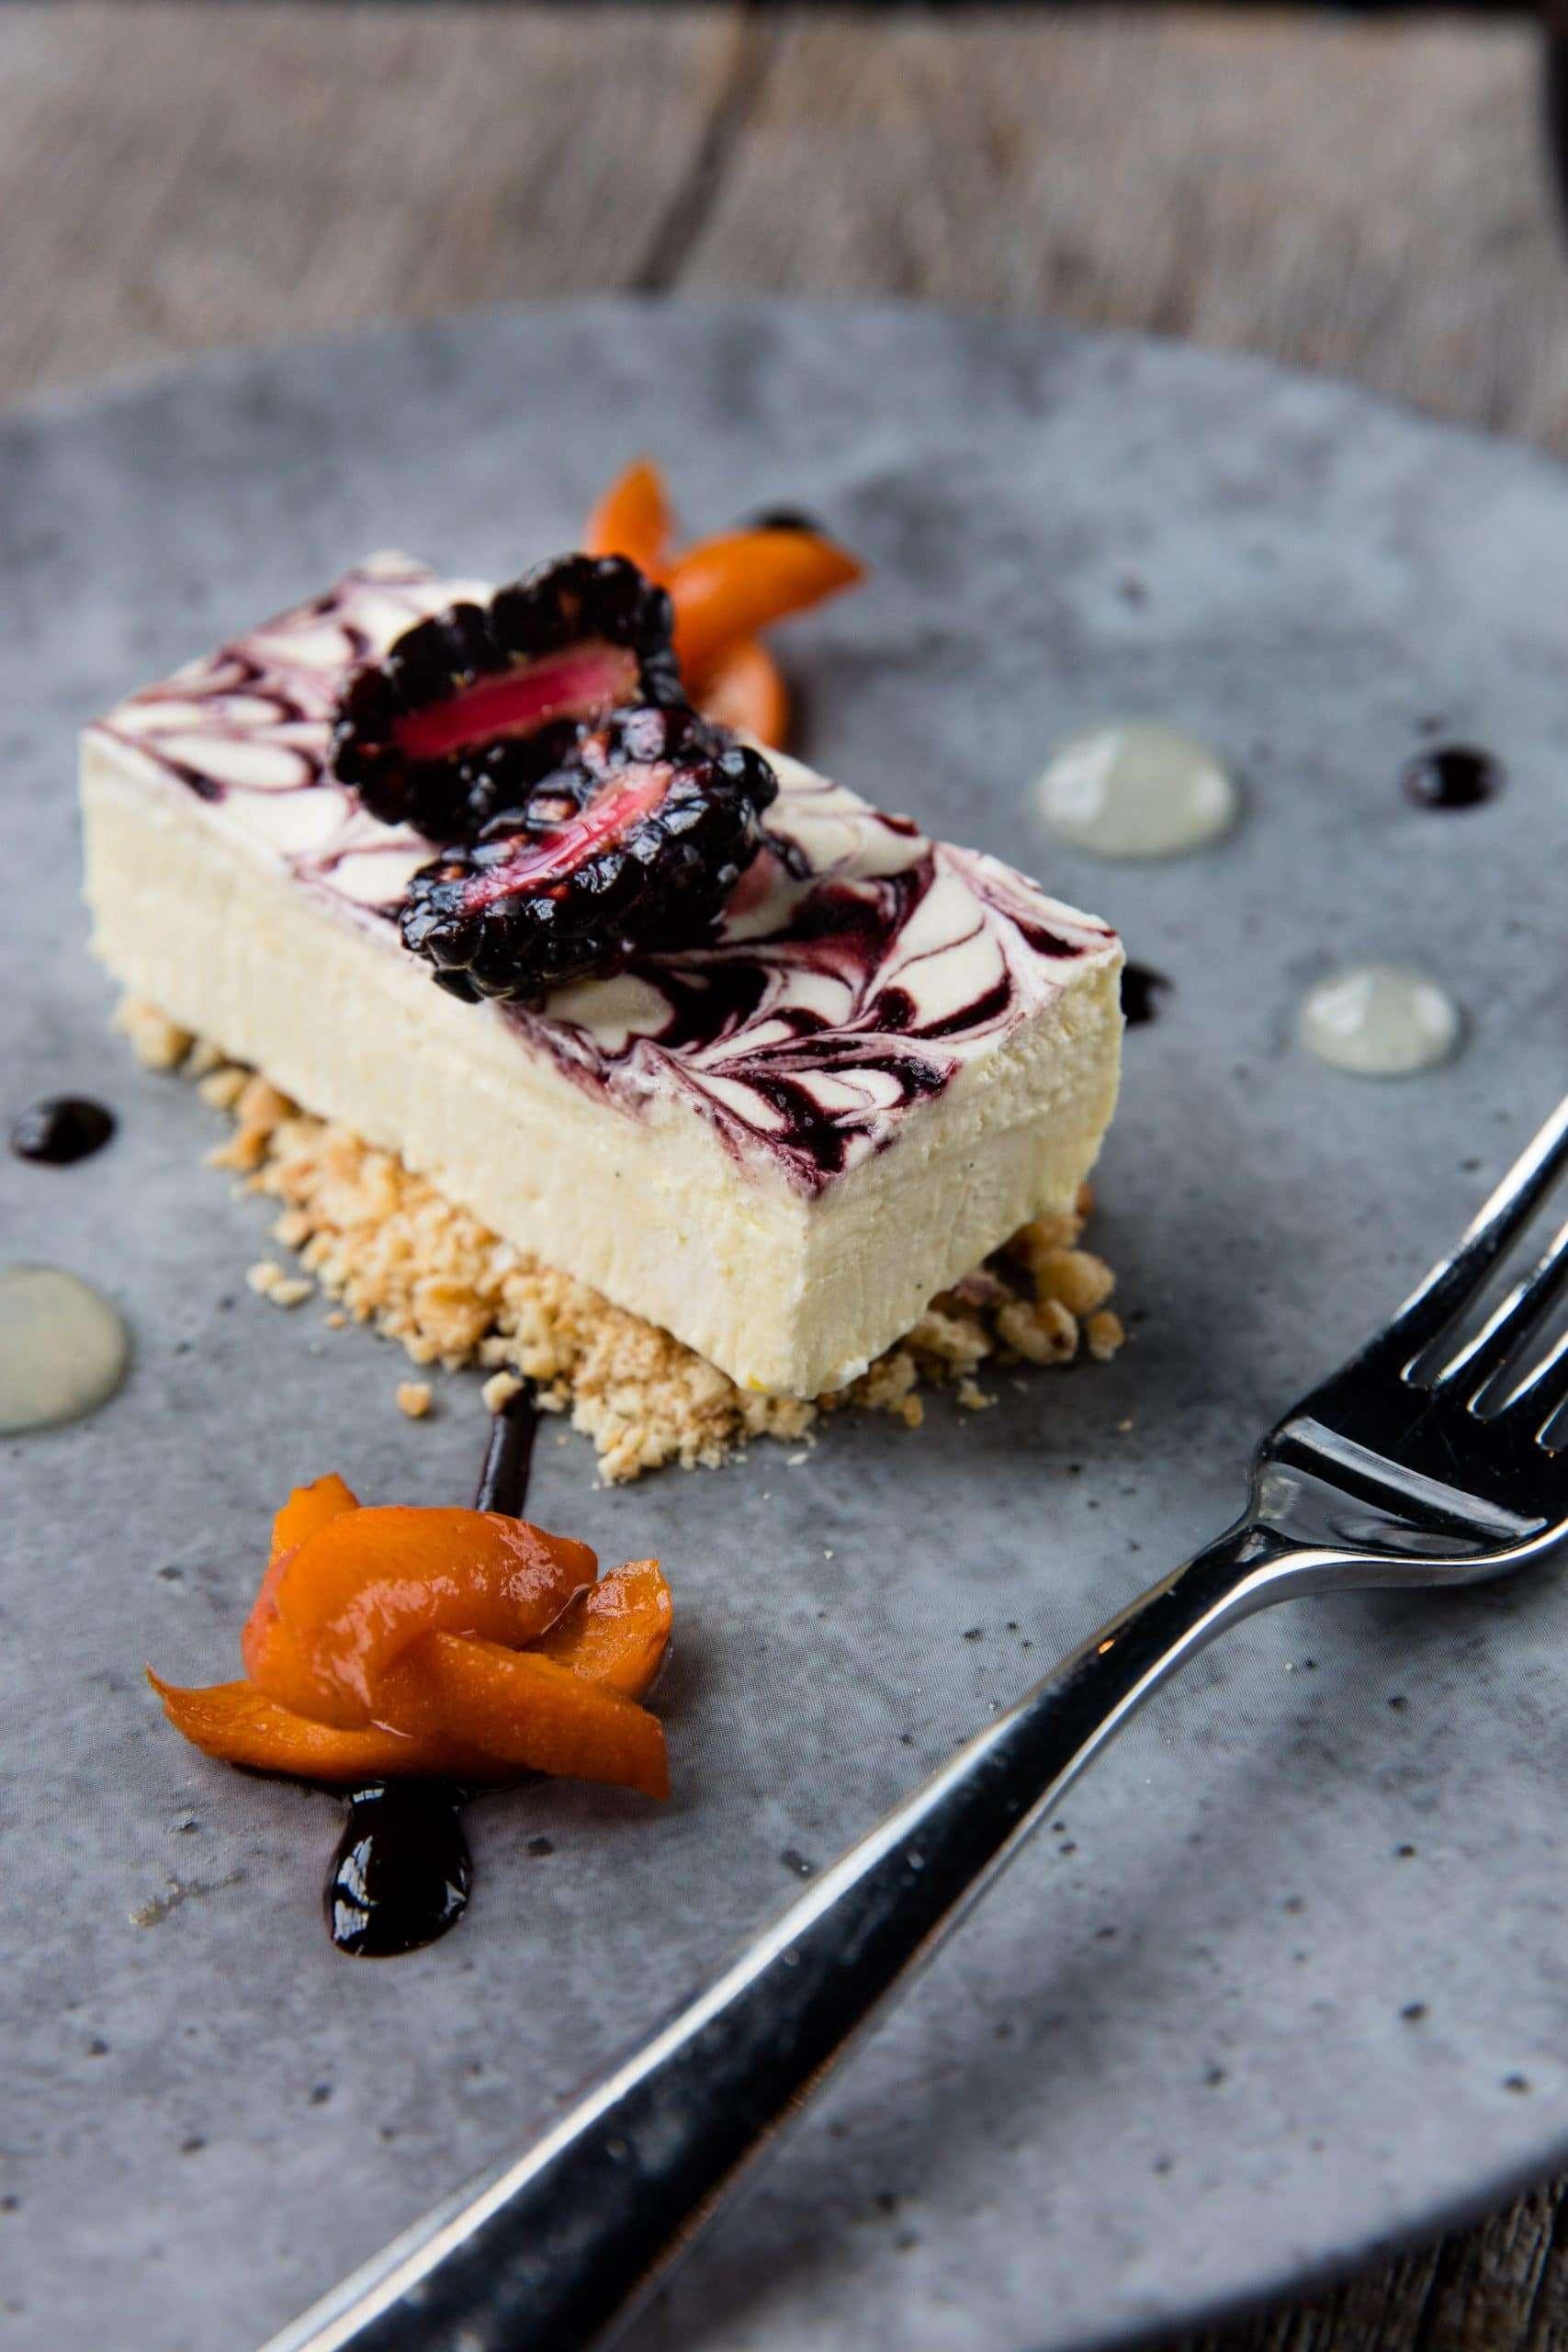 Dessert photographer Brent Herrig captured this rectangular slice of blackberry swirled cheesecake. It sits upon a grey plate.